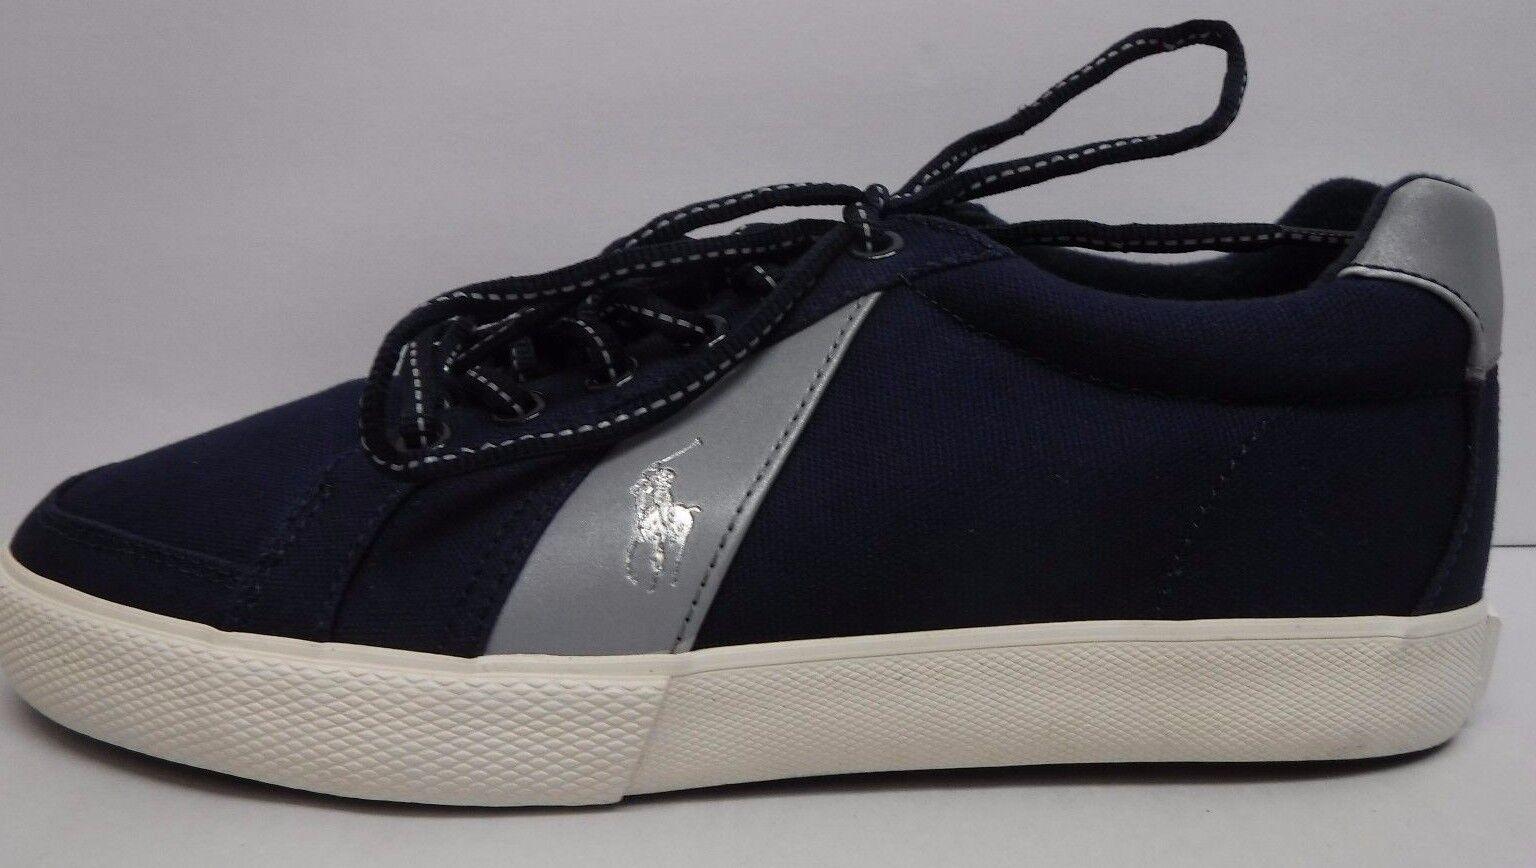 Polo Ralph Lauren Dimensione Dimensione Dimensione 8.5 blu scarpe da ginnastica New Uomo scarpe d57cae